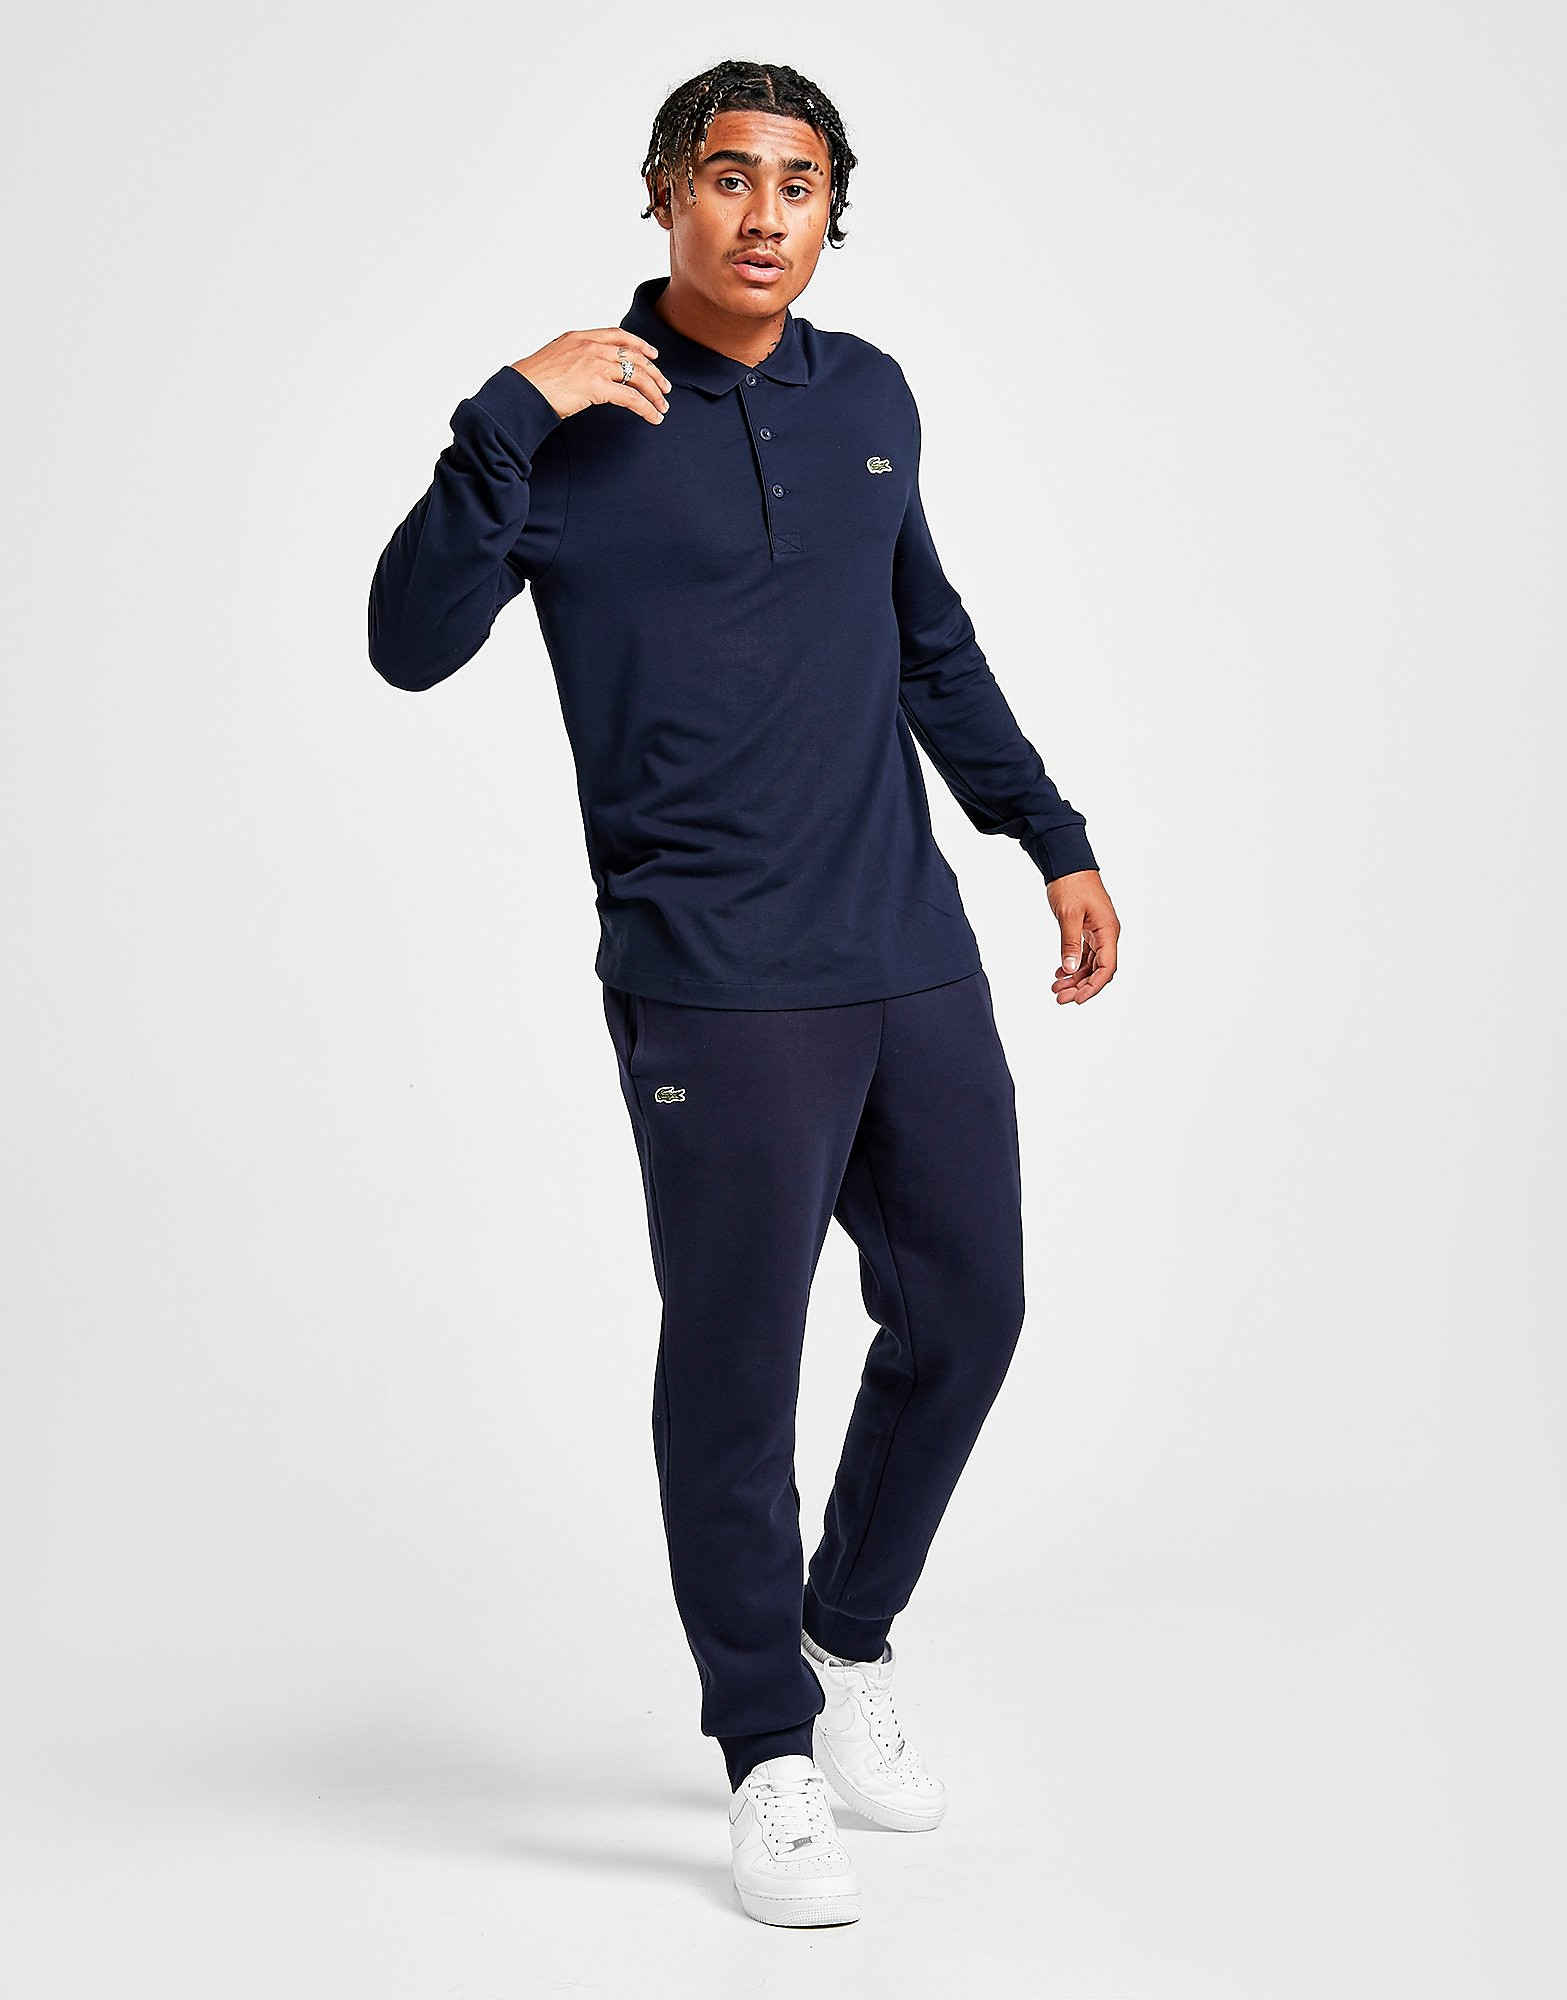 25696238ac548c Lacoste Slim Cuffed Fleece Pants - Blau - Mens, Blau   Kleidung ...